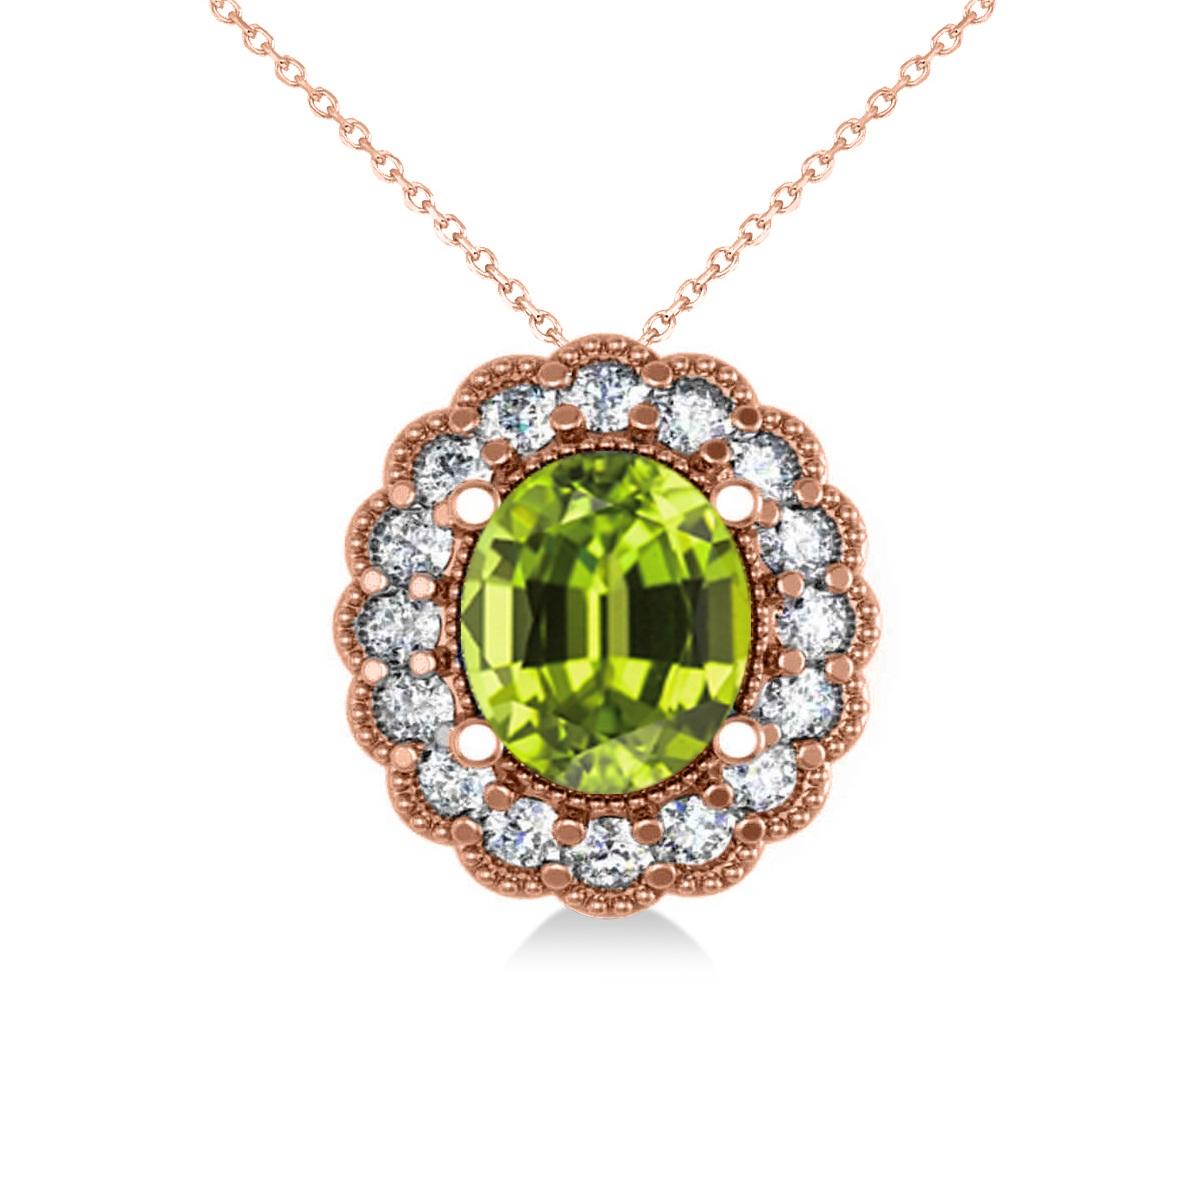 Peridot & Diamond Floral Oval Pendant Necklace 14k Rose Gold (2.98ct)